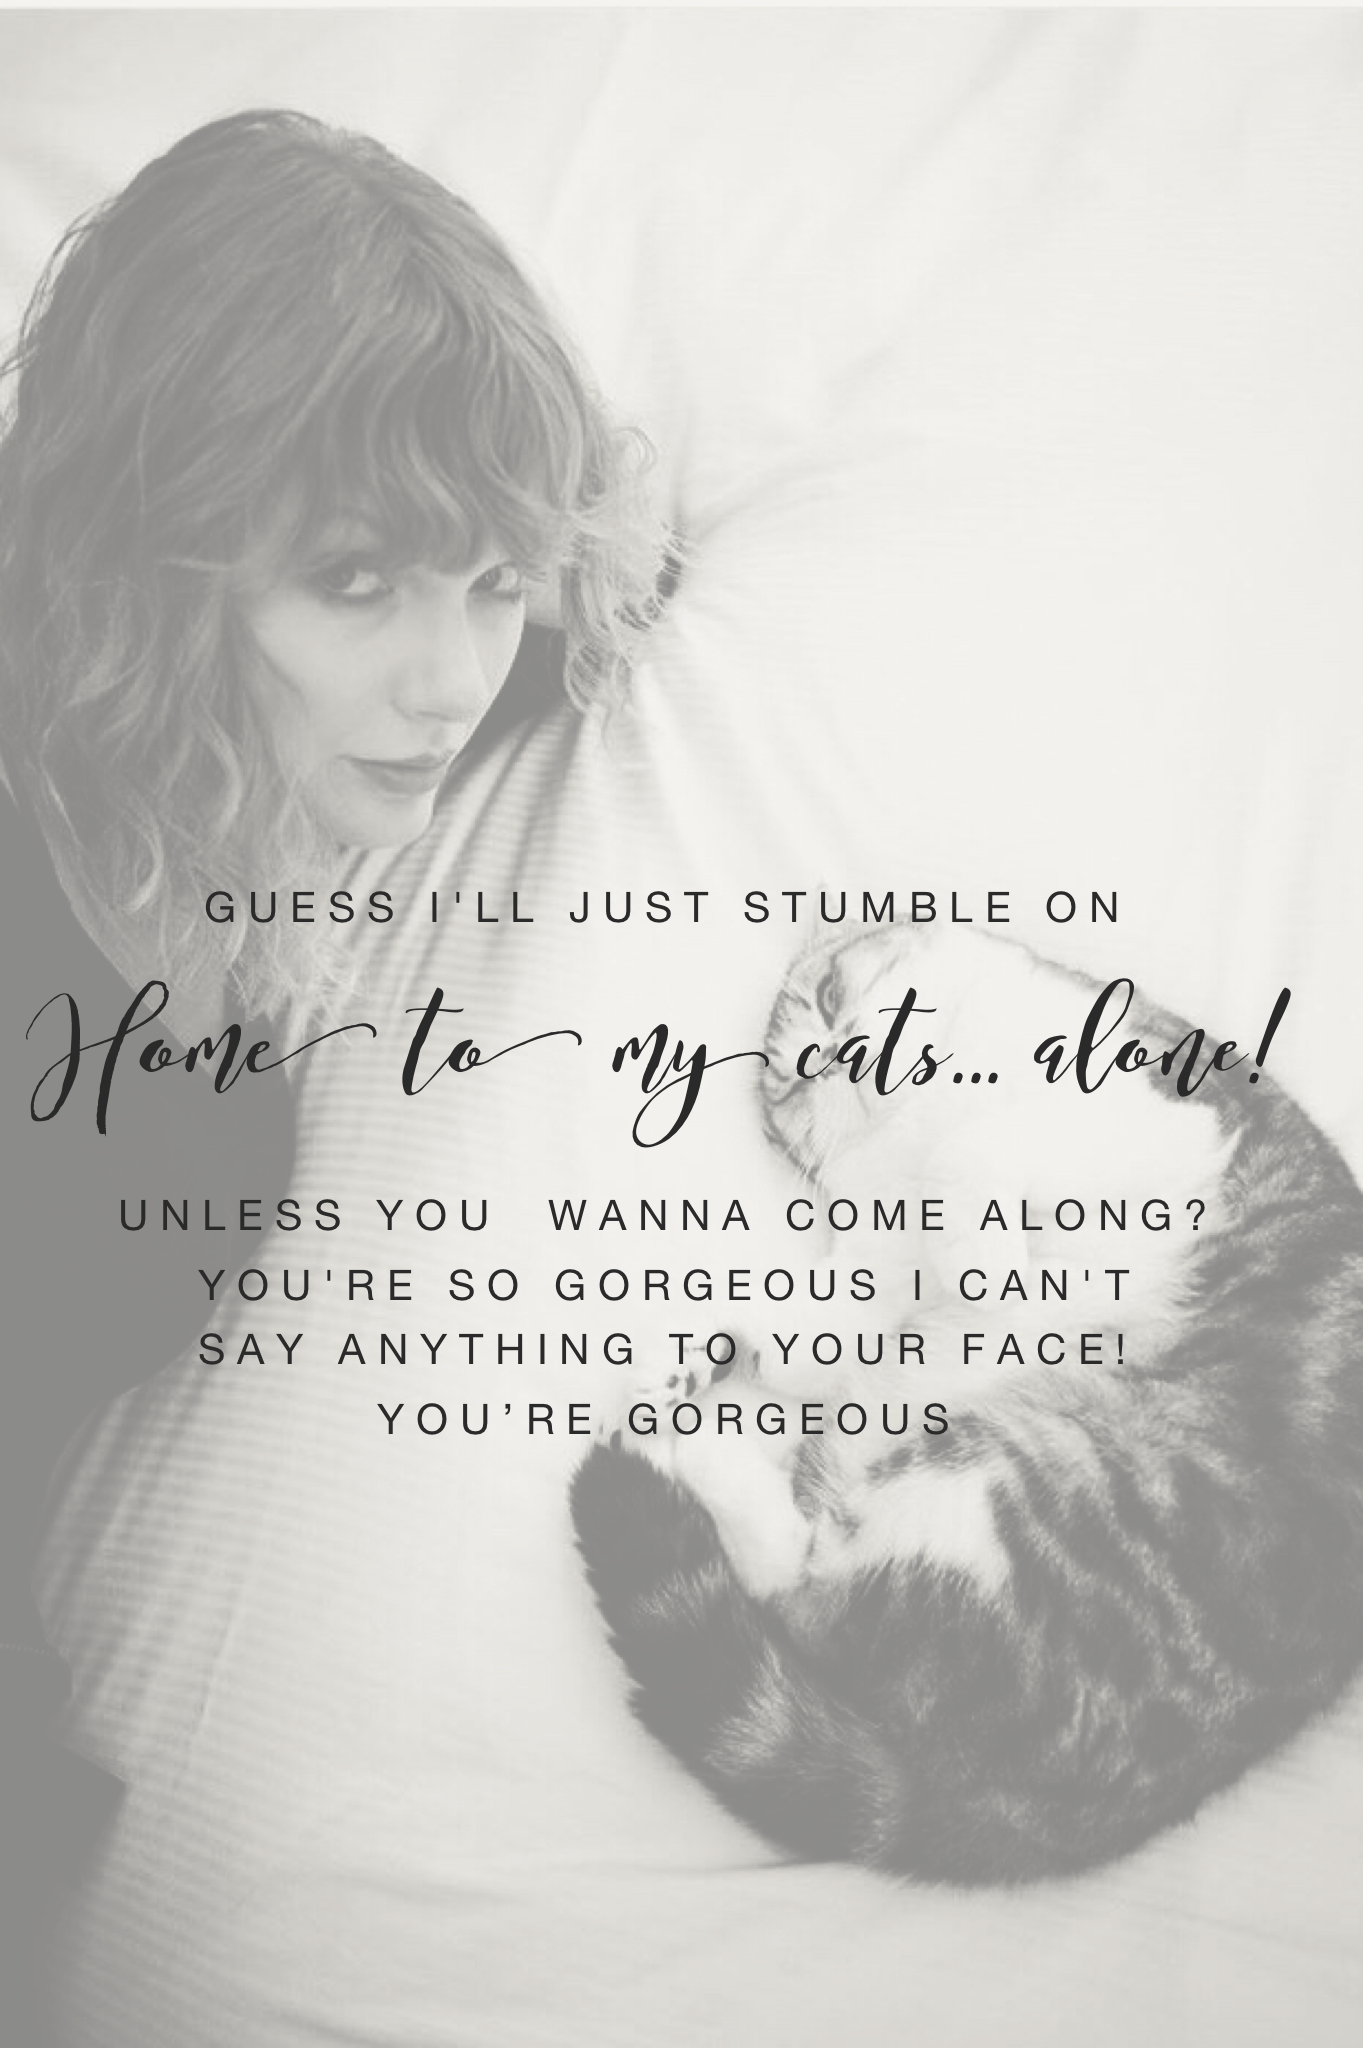 Gorgeous taylorswift reputation lyrics edit Tumblr ...